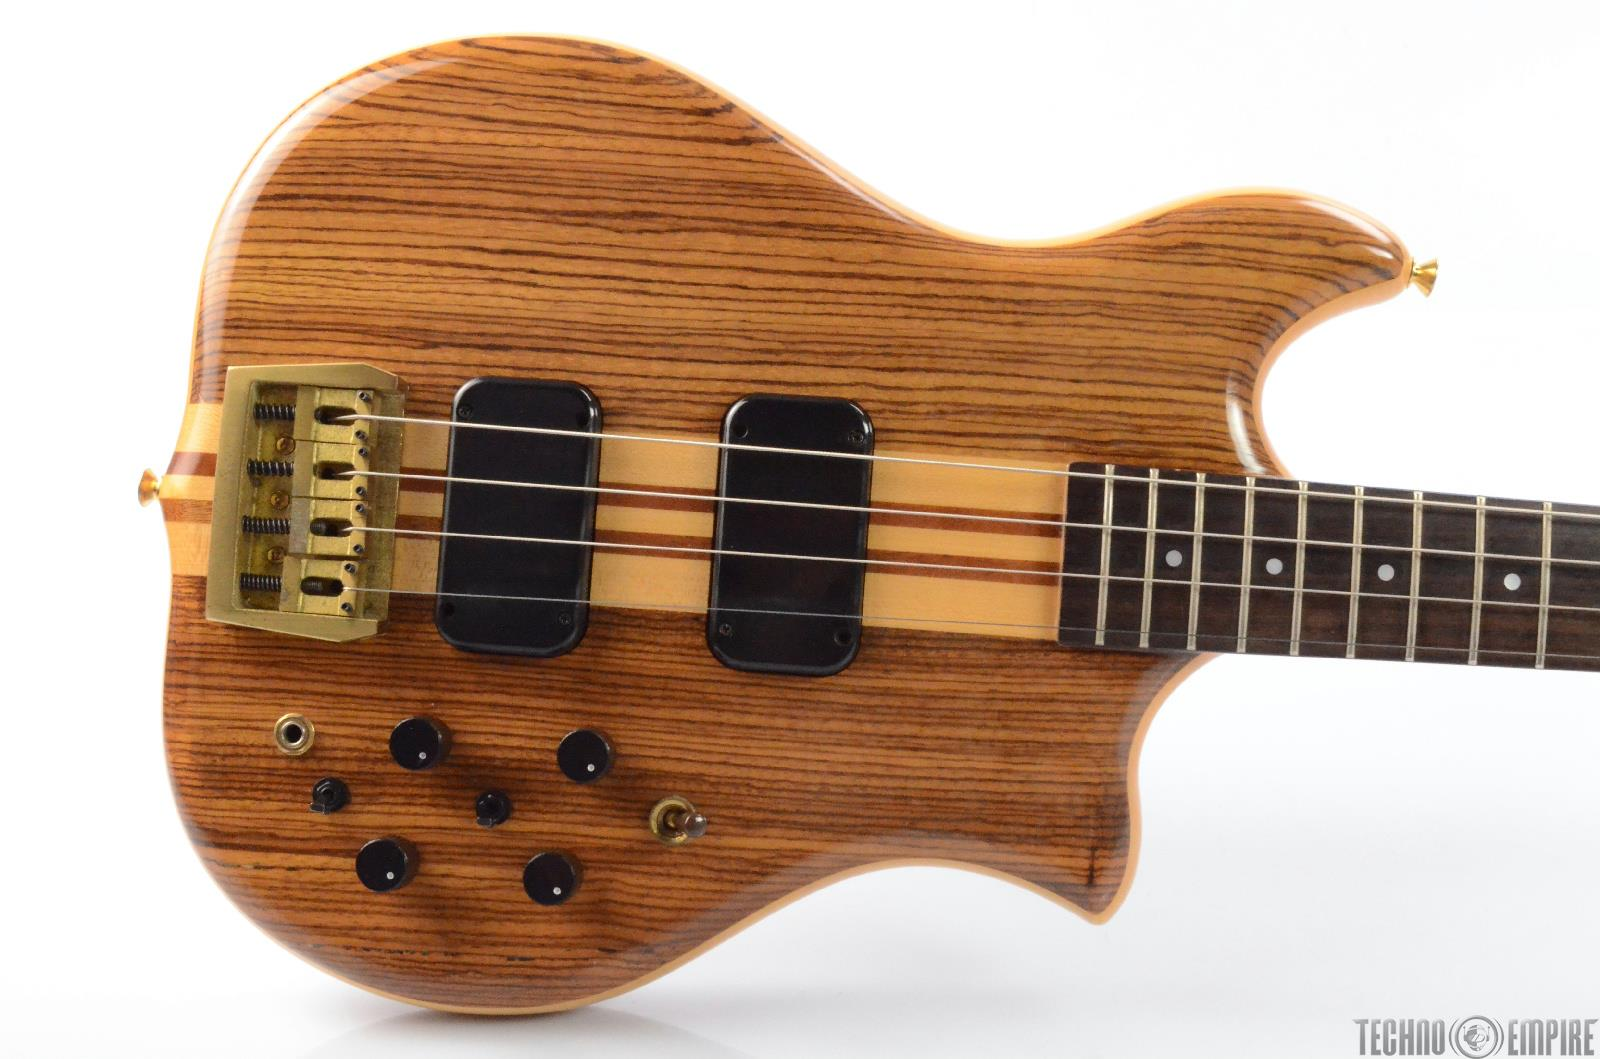 kawai fiib f2b alembic model electric bass guitar mij japan w case 26372 ebay. Black Bedroom Furniture Sets. Home Design Ideas